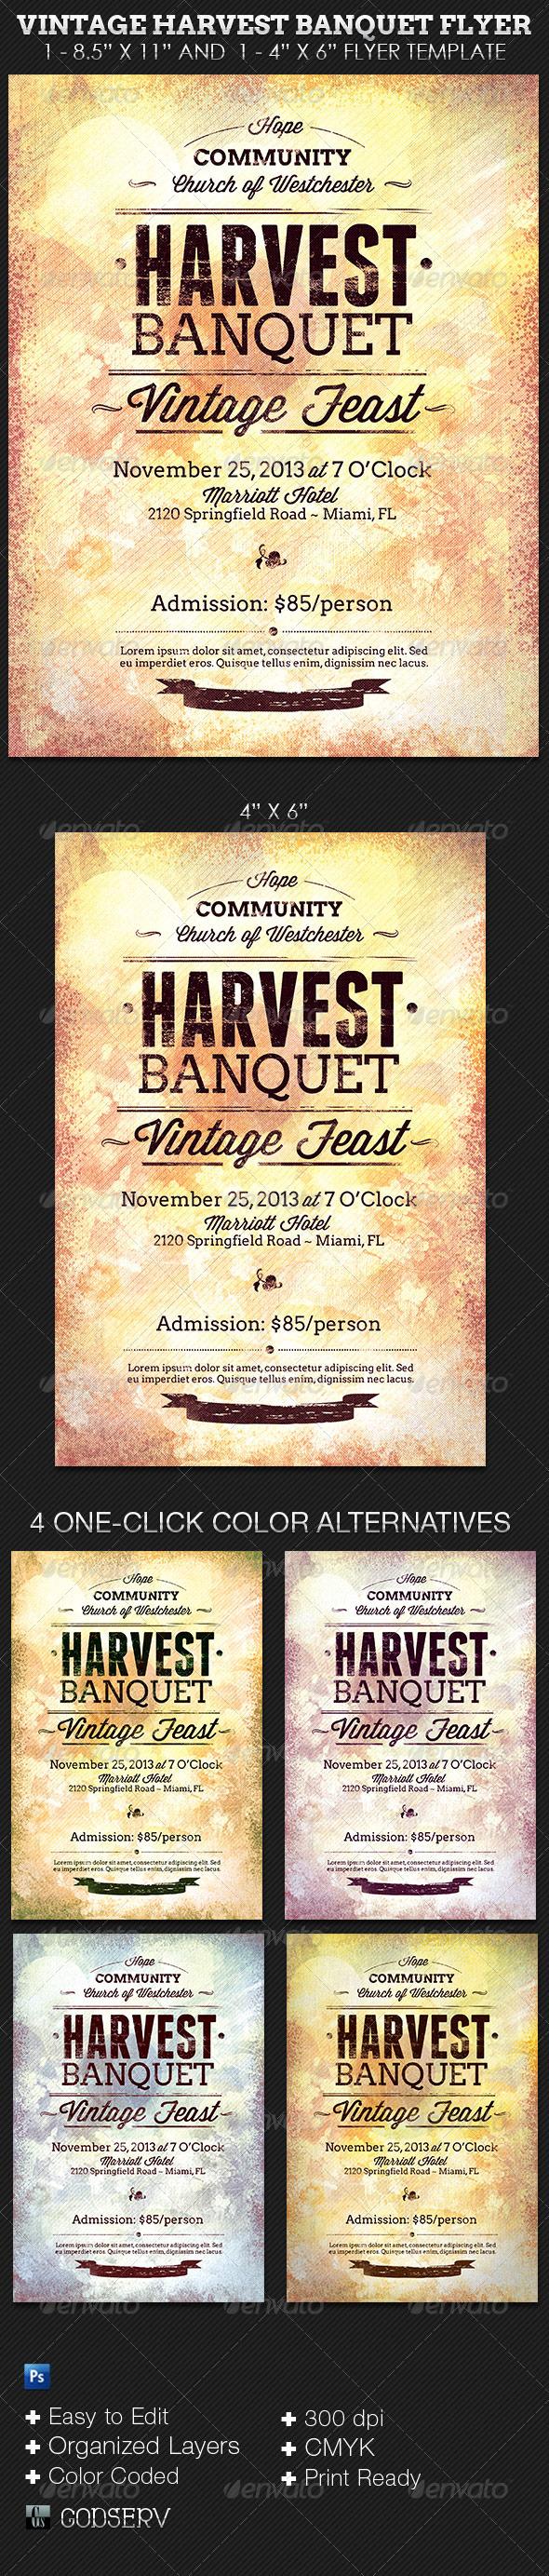 GraphicRiver Vintage Harvest Banquet Flyer Template 5737722